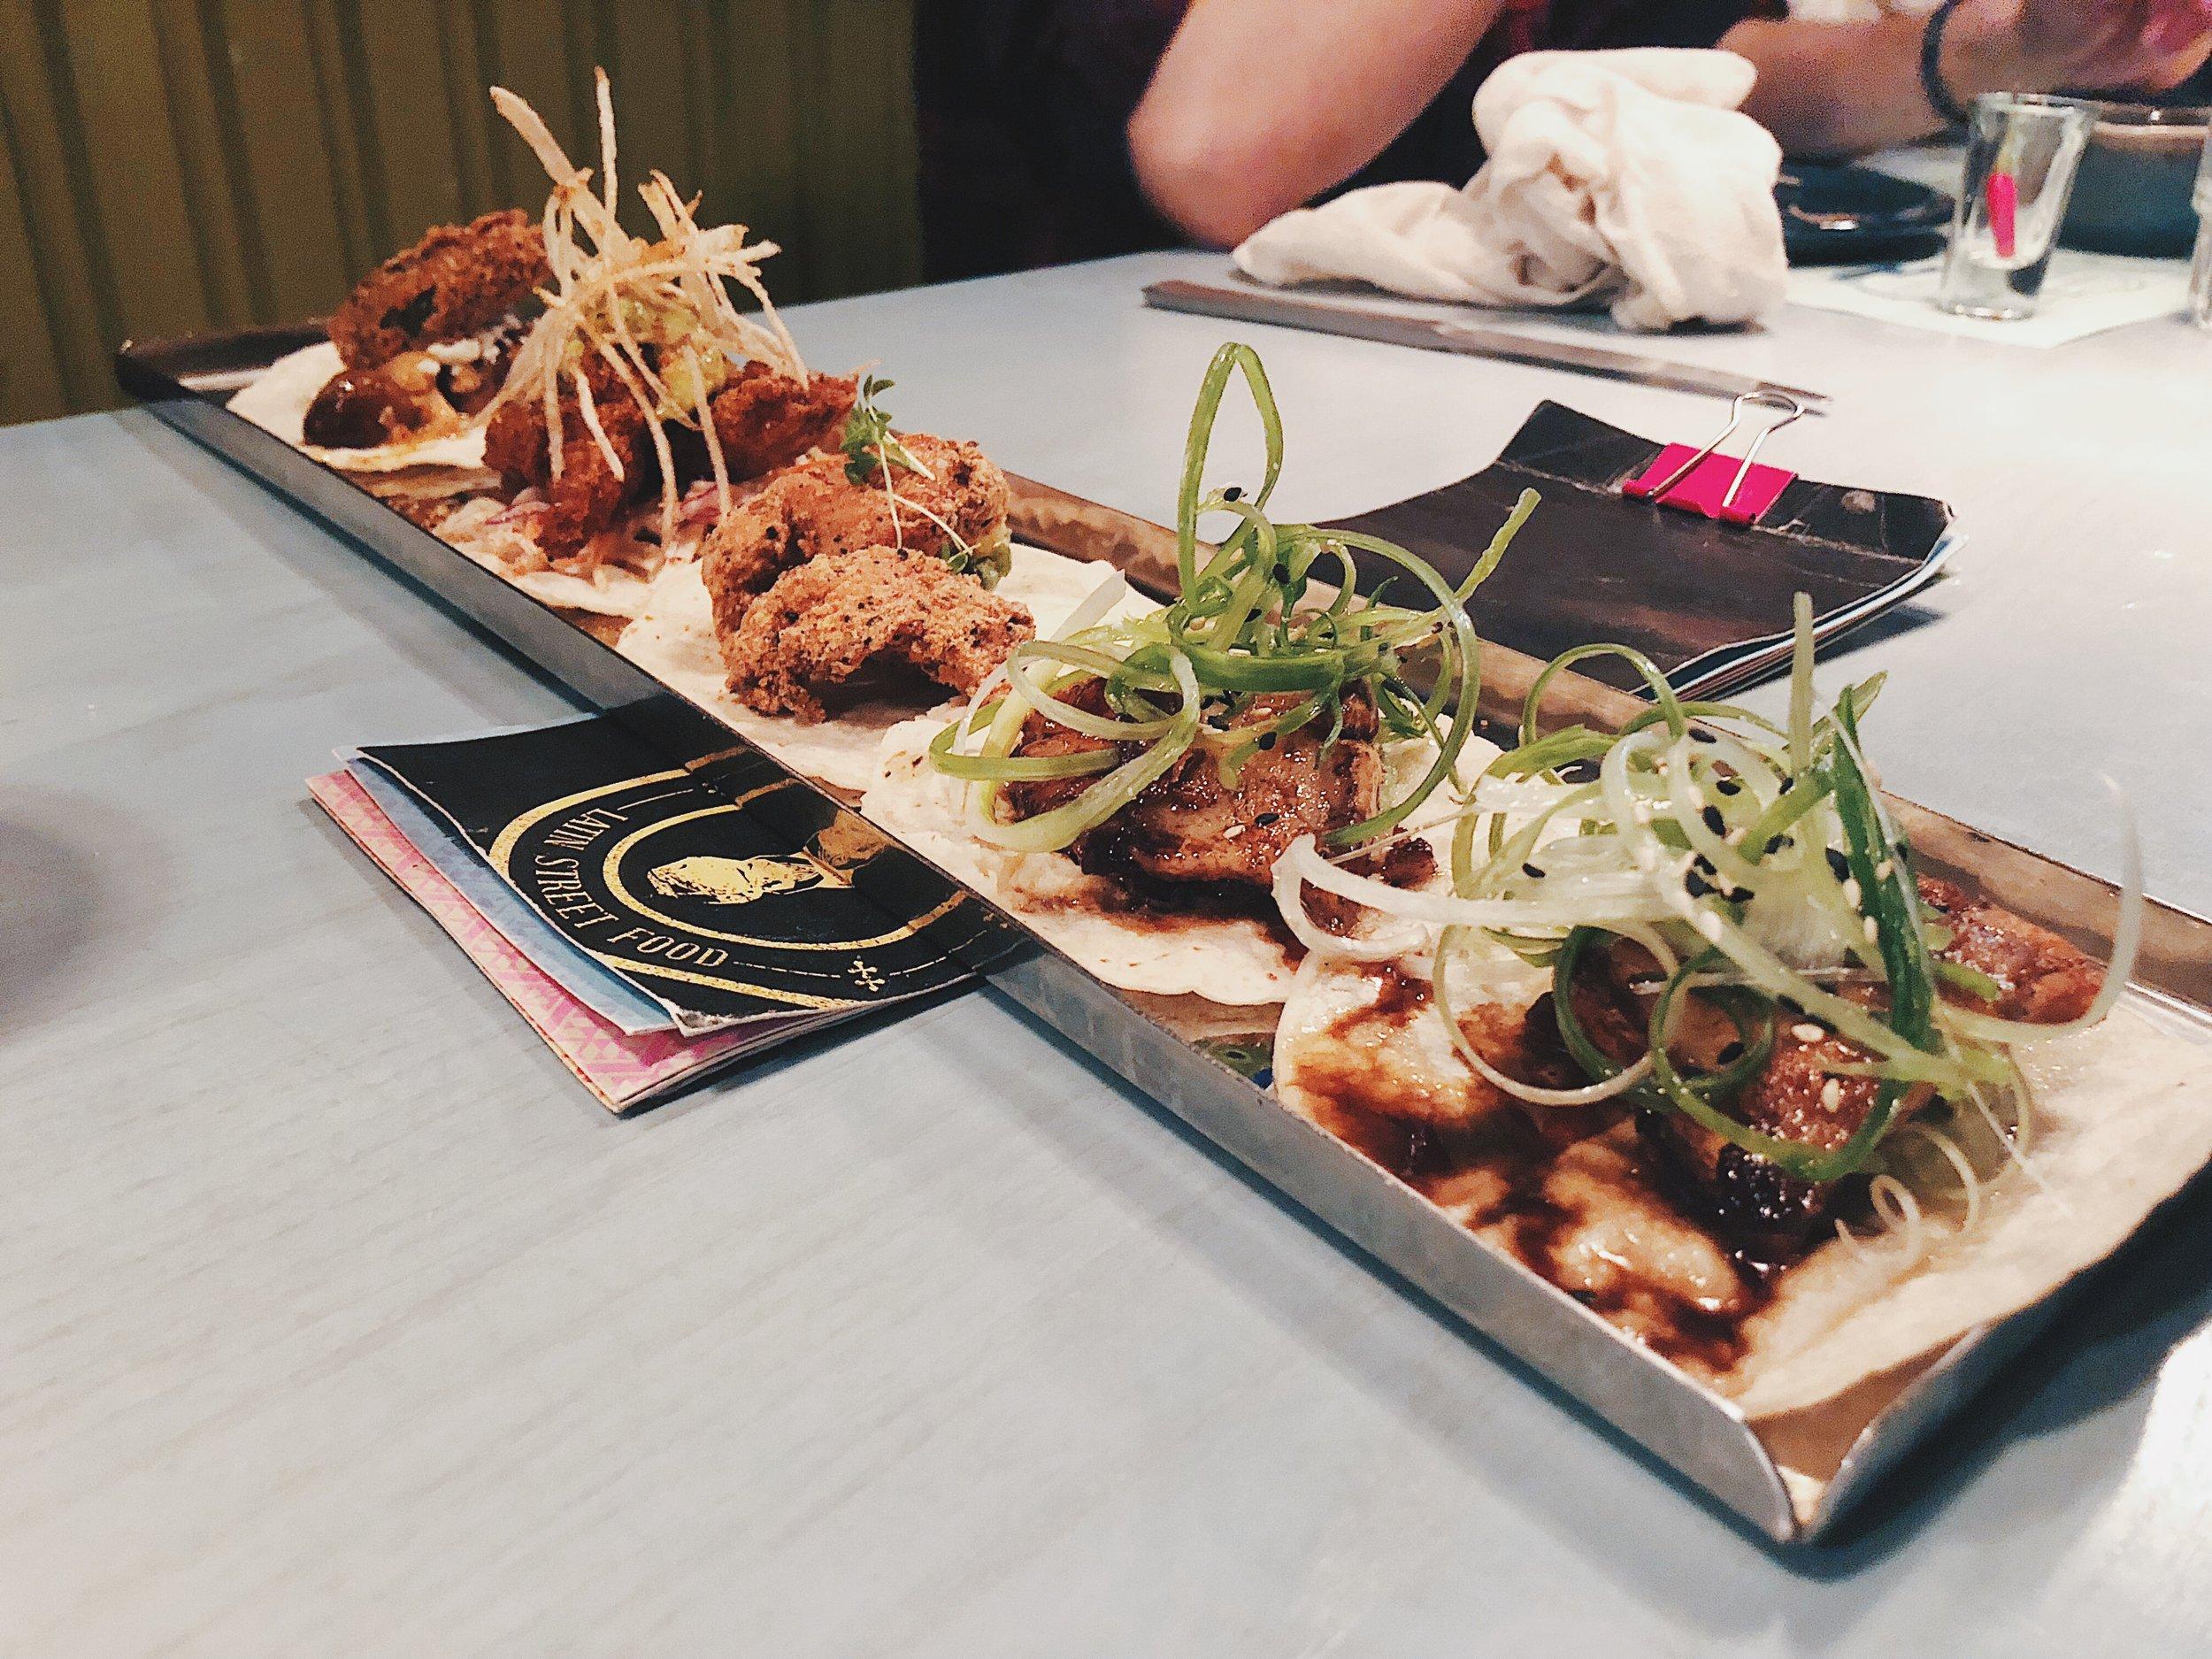 Atole Fried Chicken — serano, yuzu aioli, corn esquites, tajin